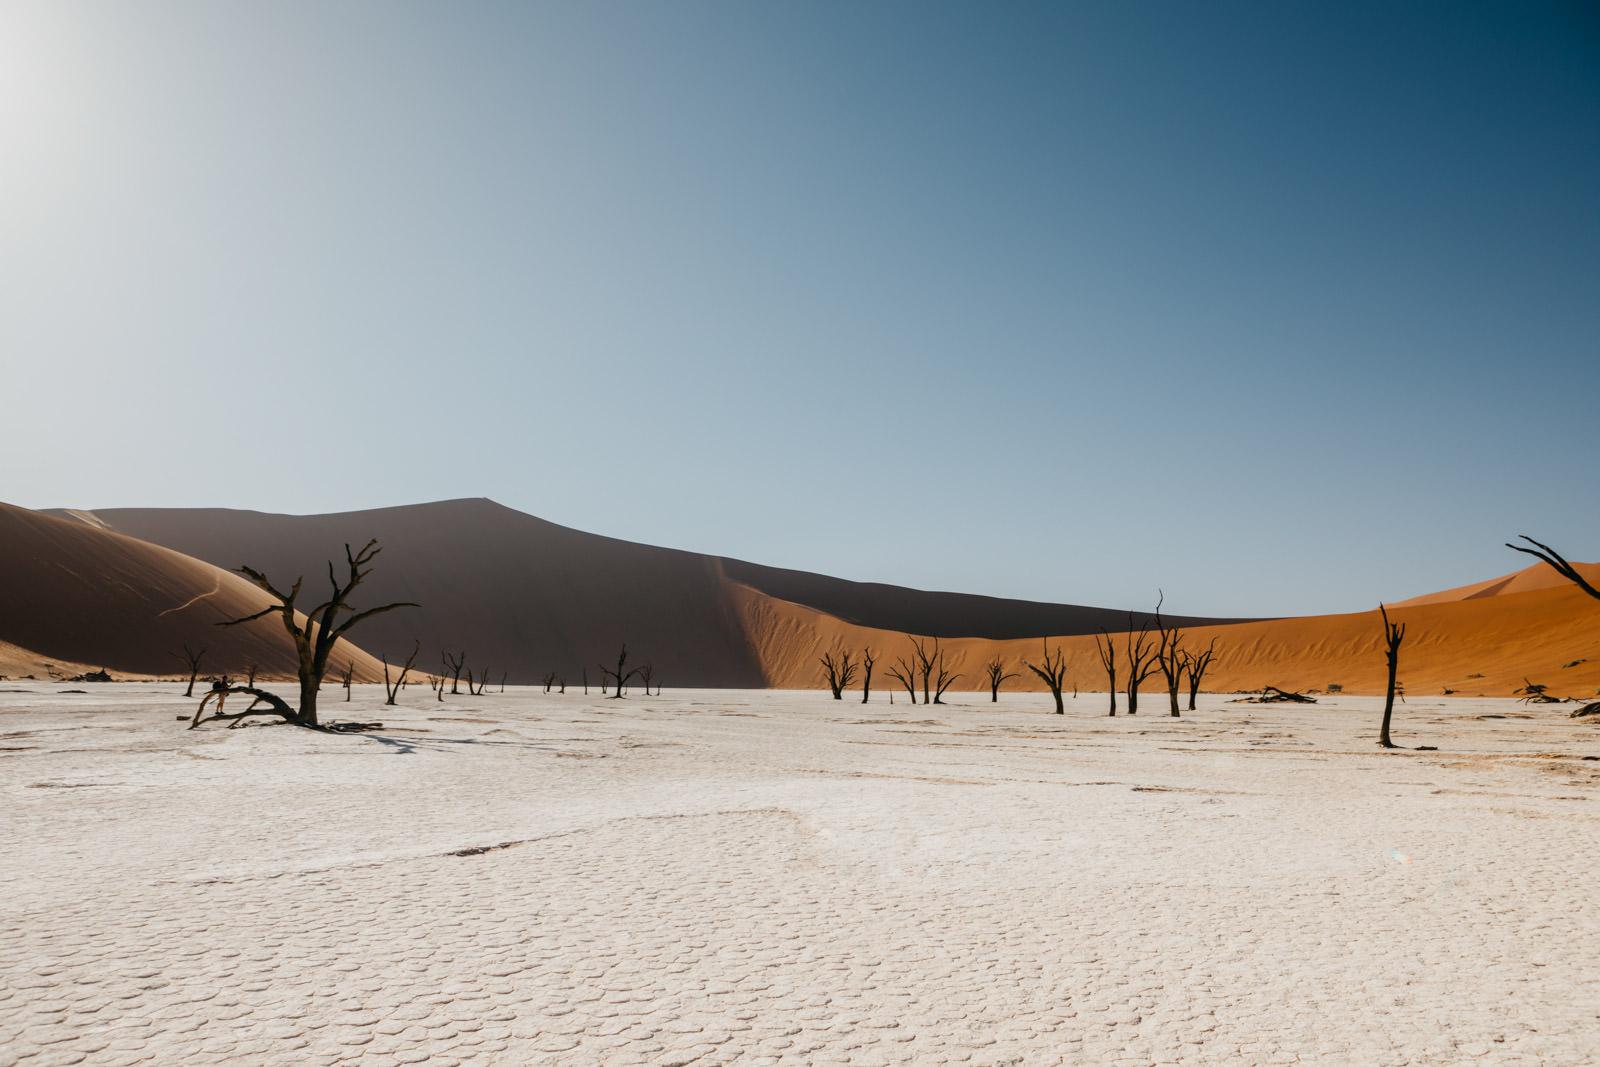 namibia_trip_rooftent_camping_roadtrip (15 von 26).jpg